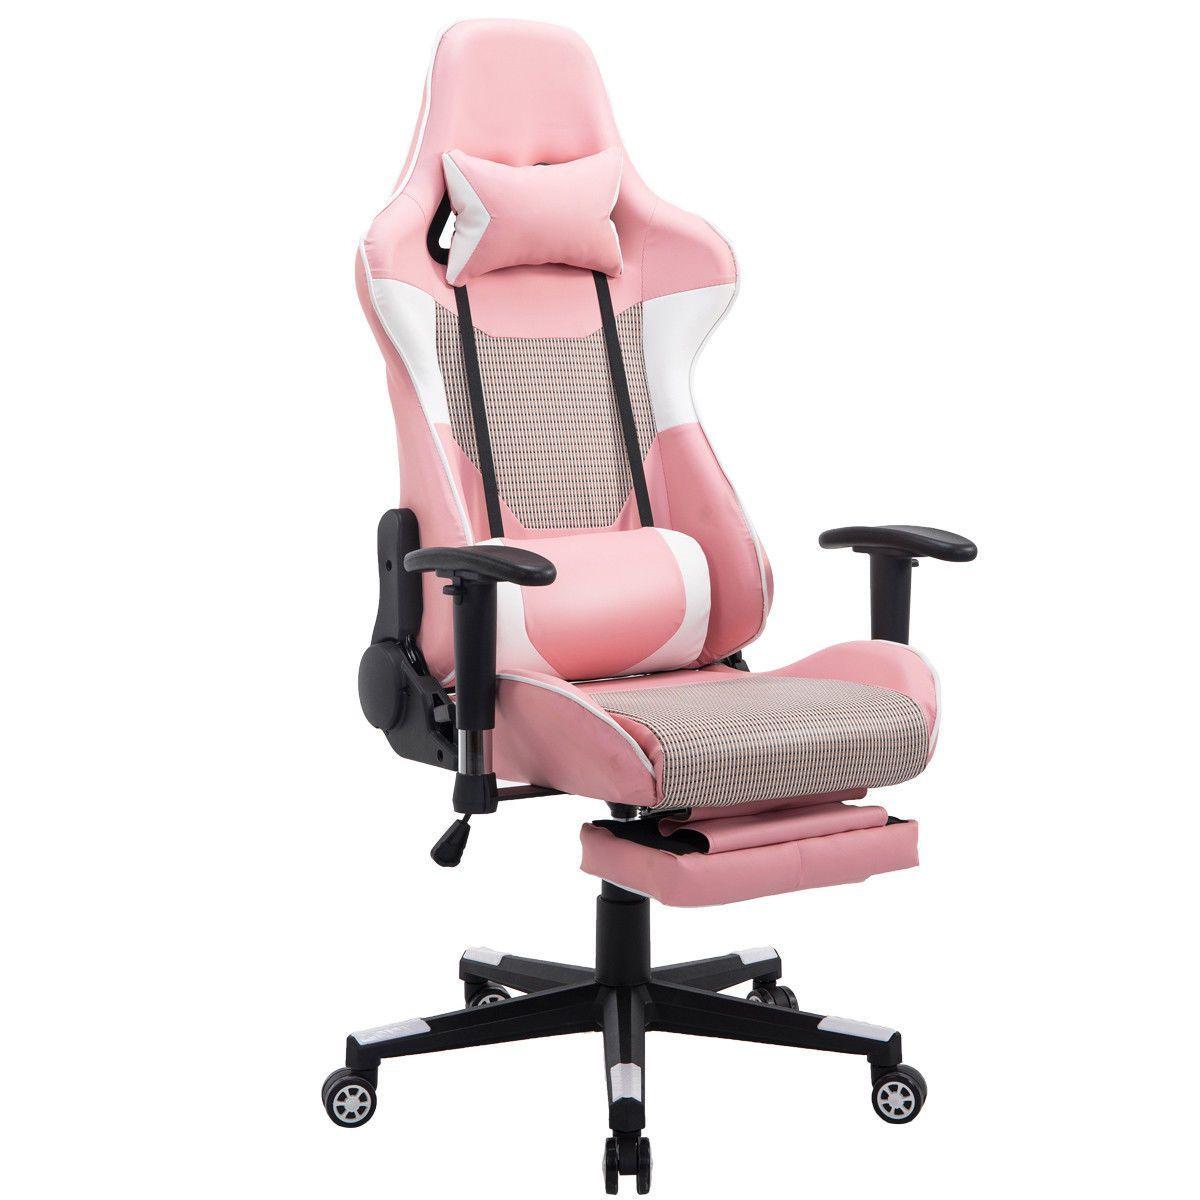 Giantex modern reclining gaming chair high back racing